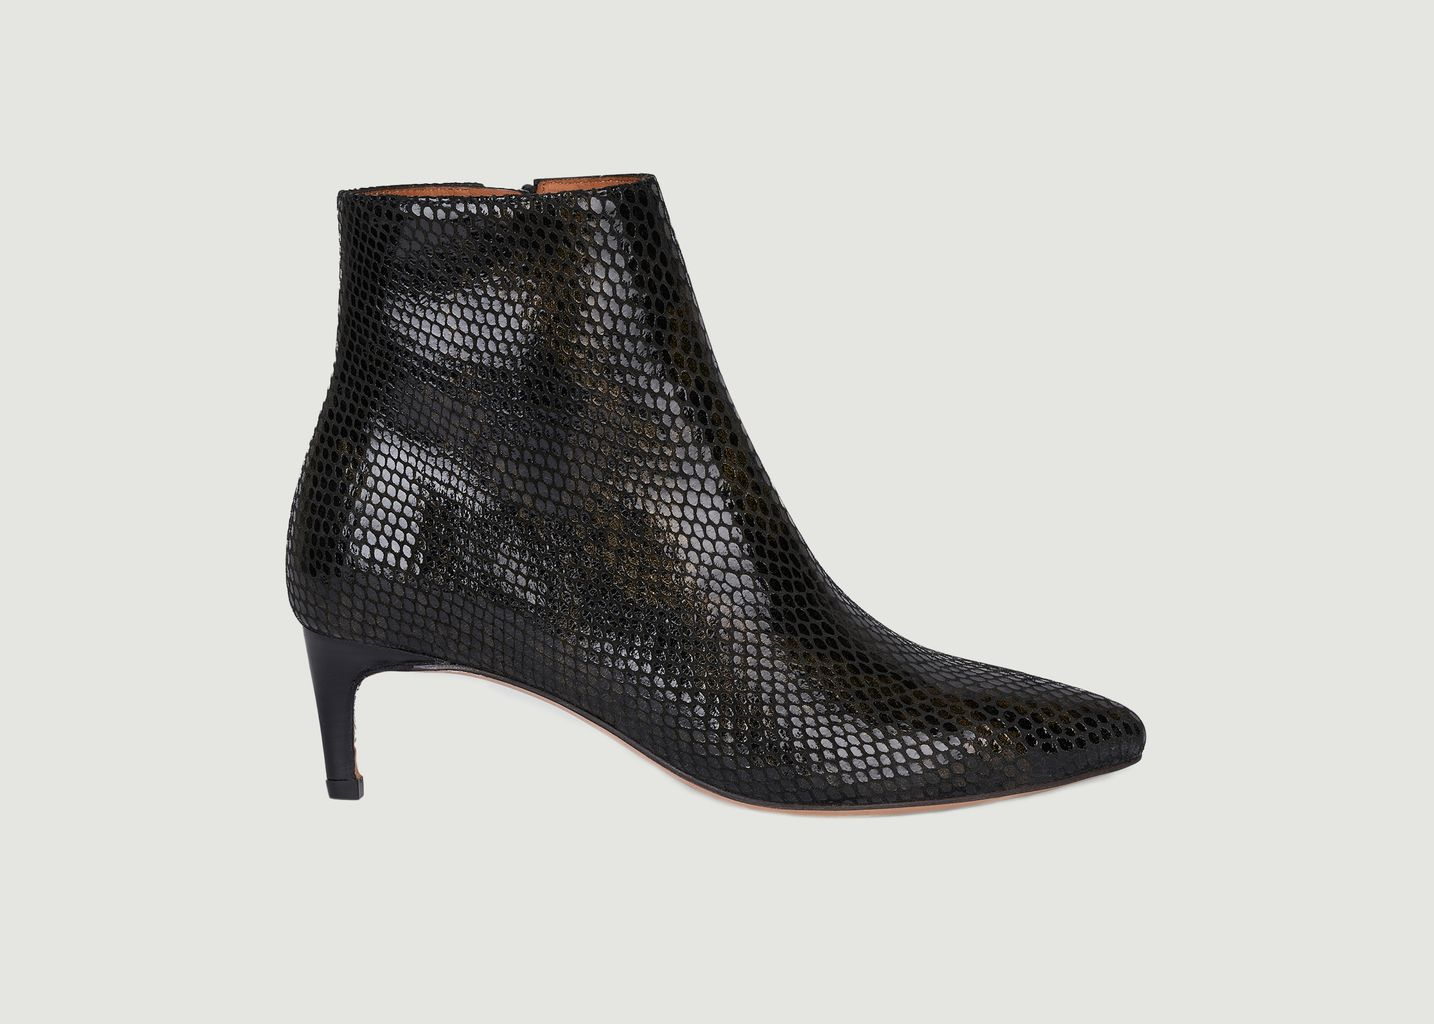 Boots Mara - Anthology Paris